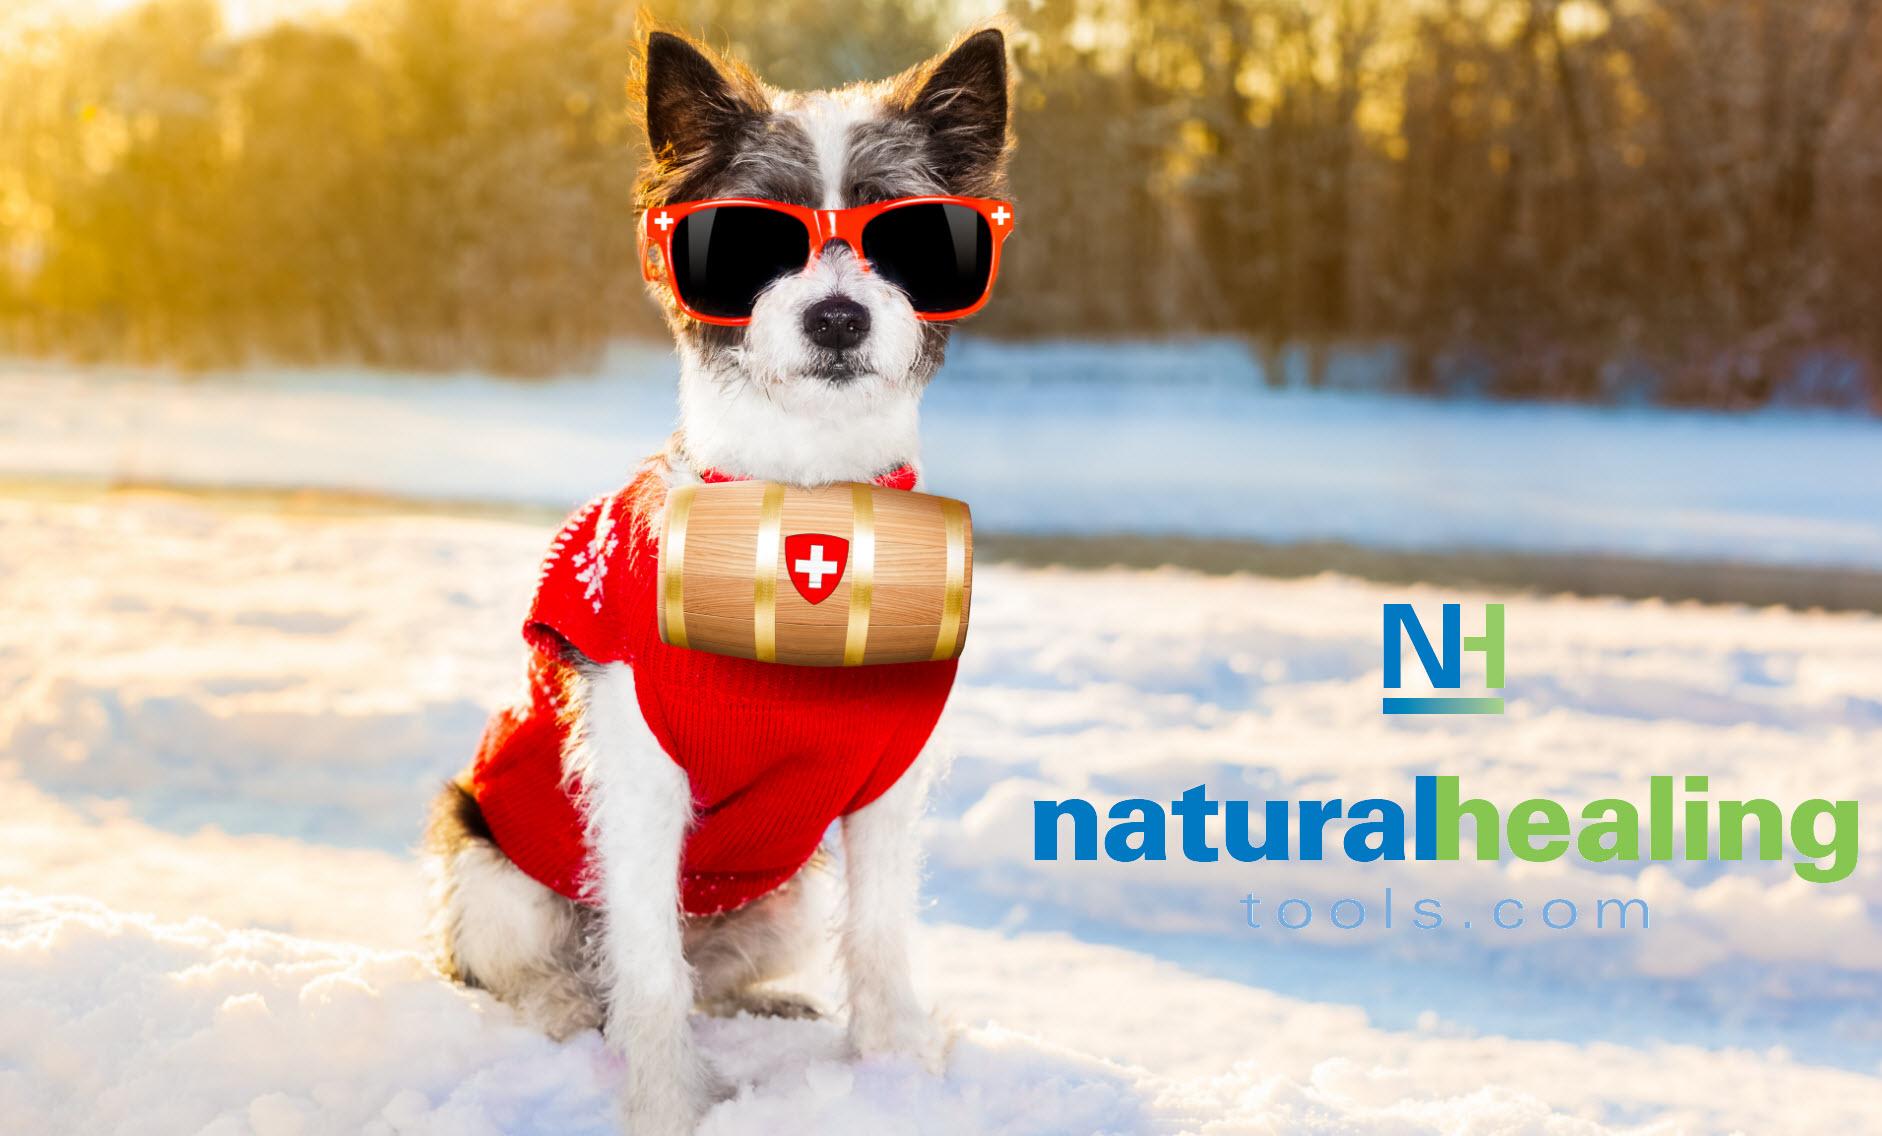 Shop Natural Healing Tools